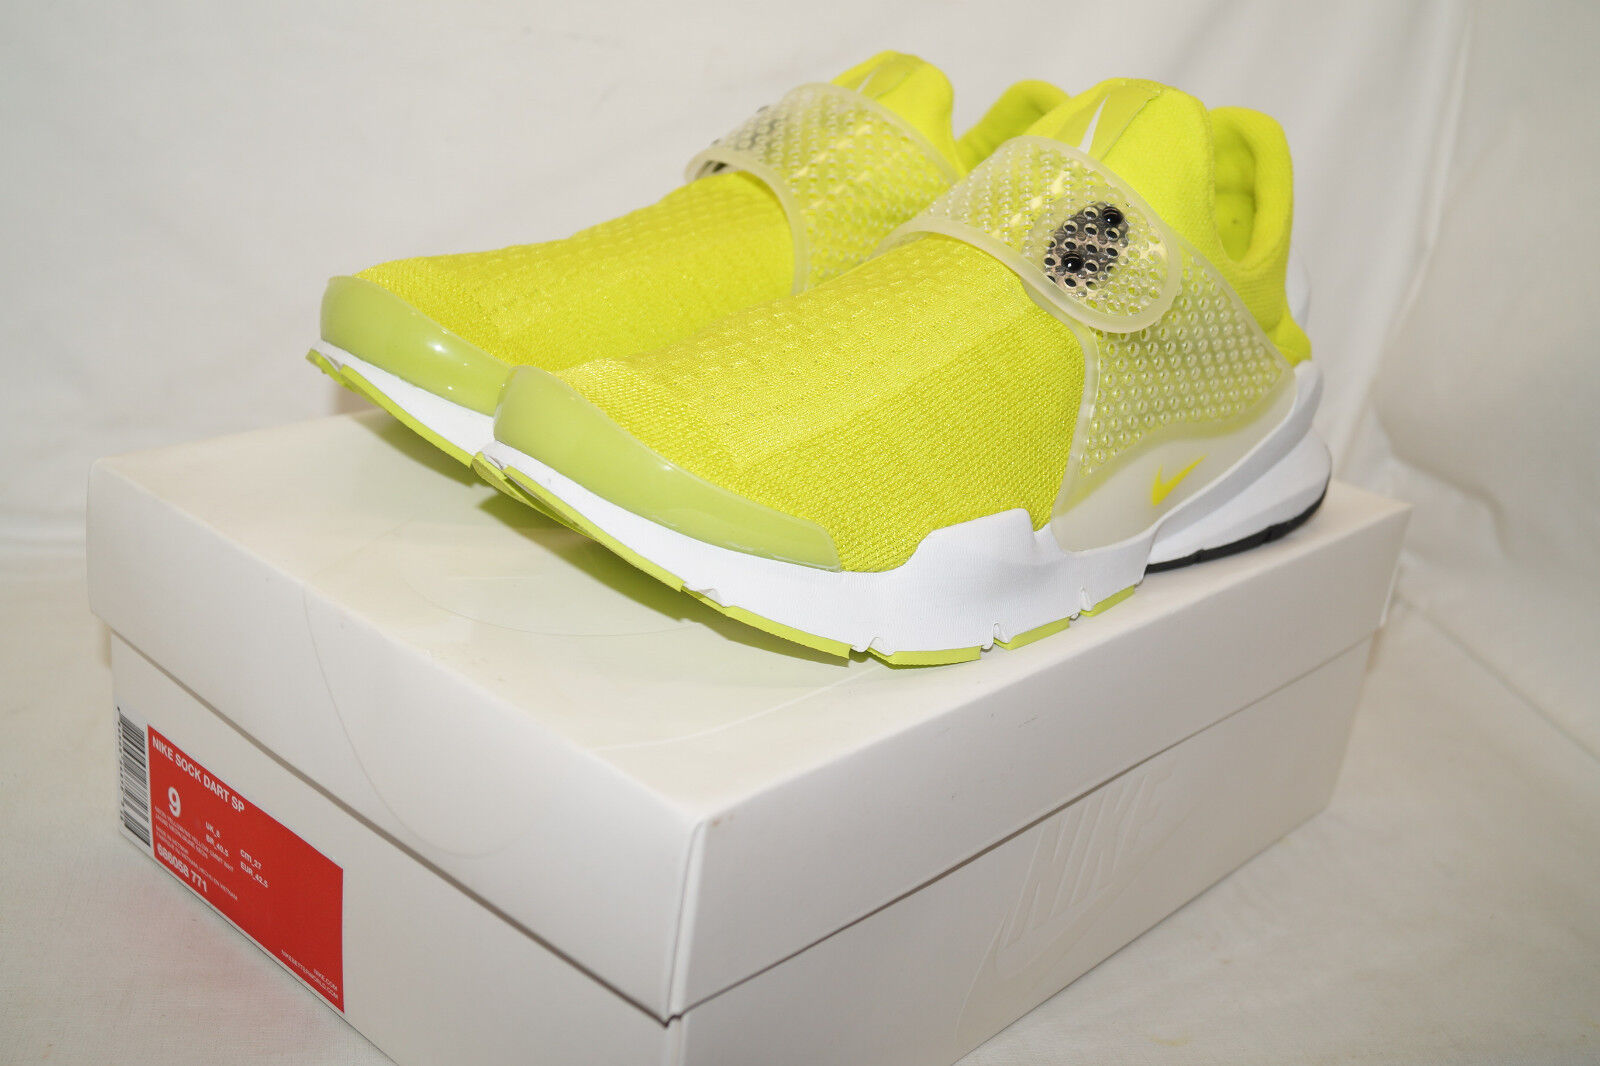 Nike laboratorio sock dardo sp neon, 5 nenon gelb grn 686058 771